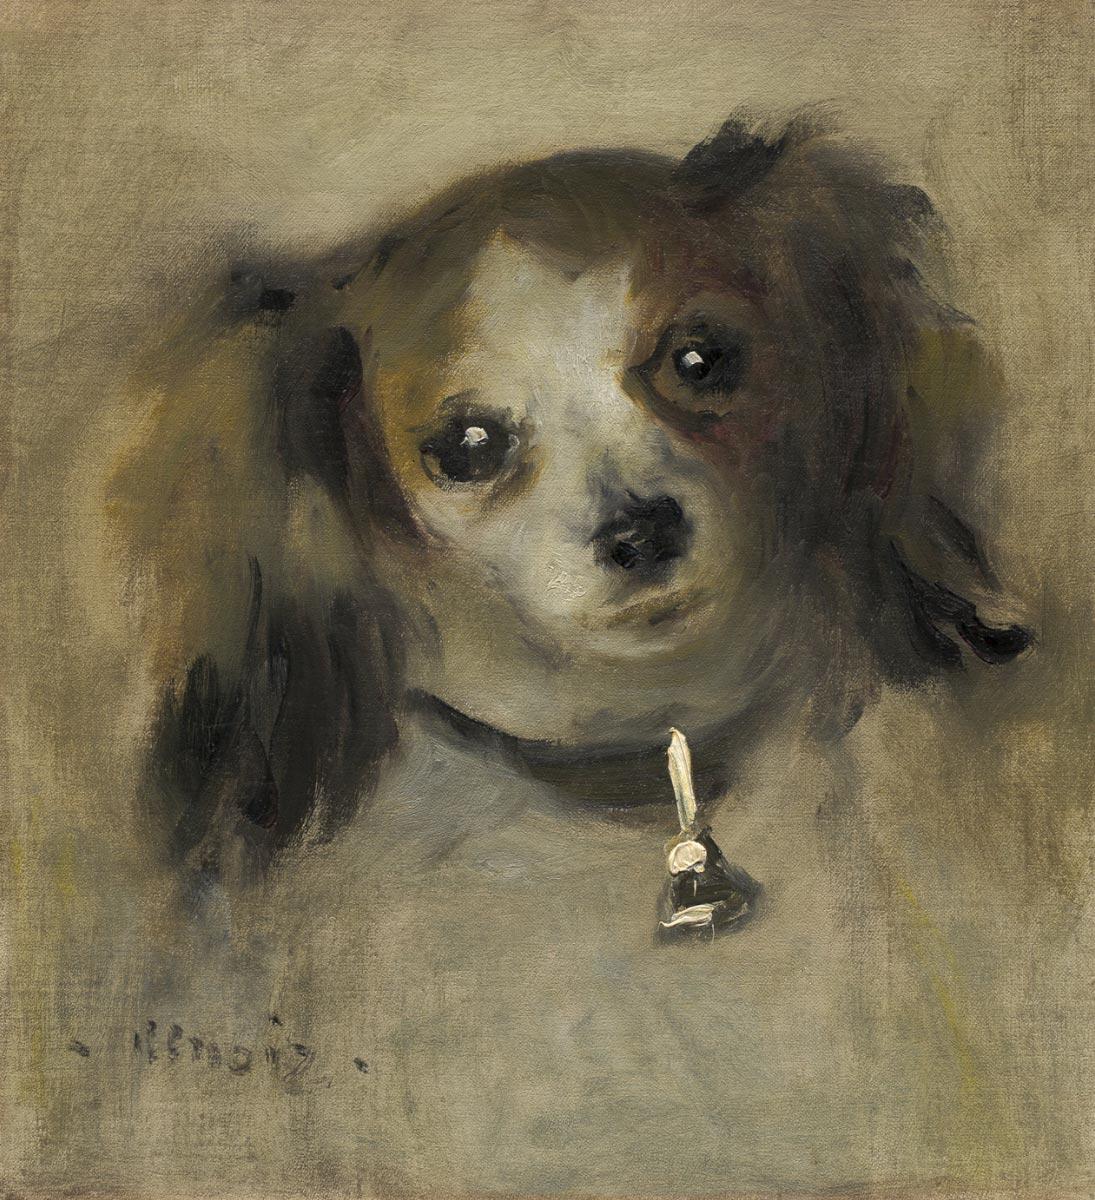 PIERRE-AUGUSTE RENOIR, Head of a Dog, 1870